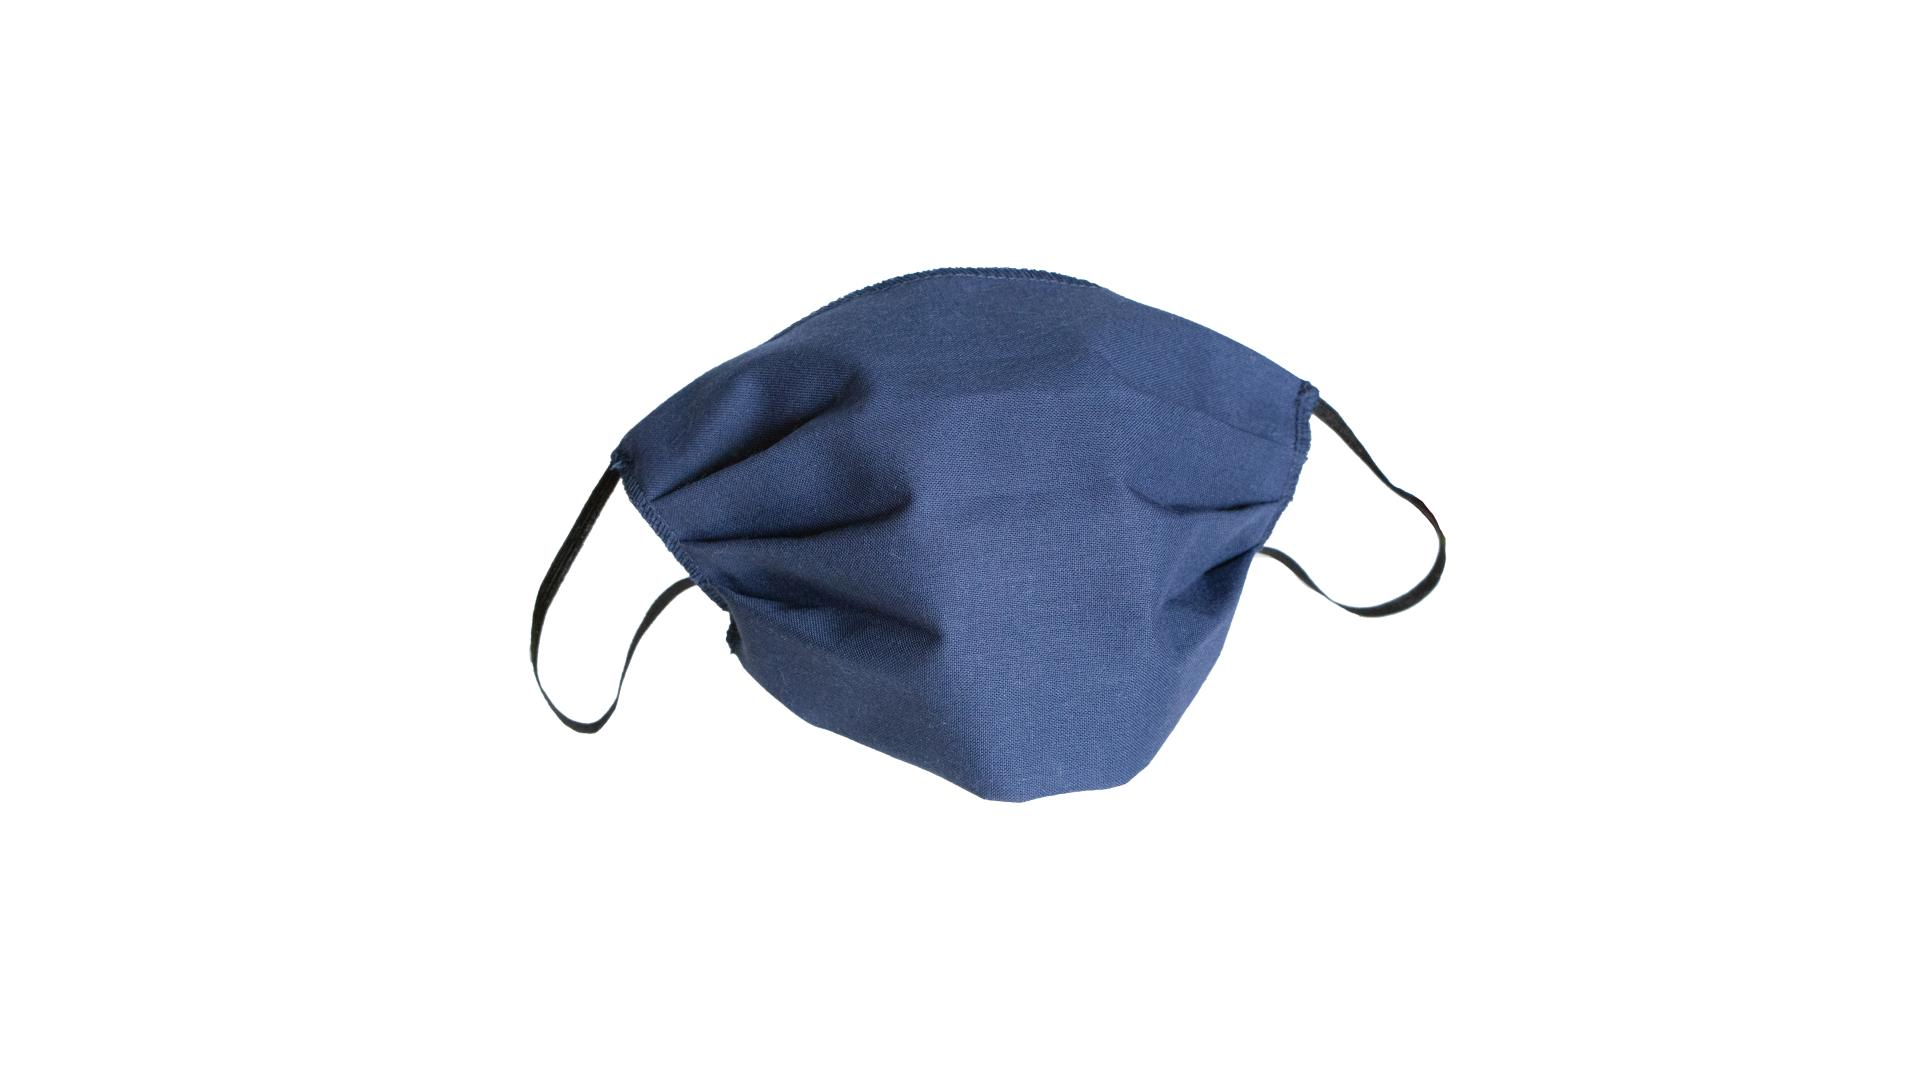 4CARS Dvouvrstvé ochranné bavlněné rouško modré bez vzoru s gumičkou 3ks